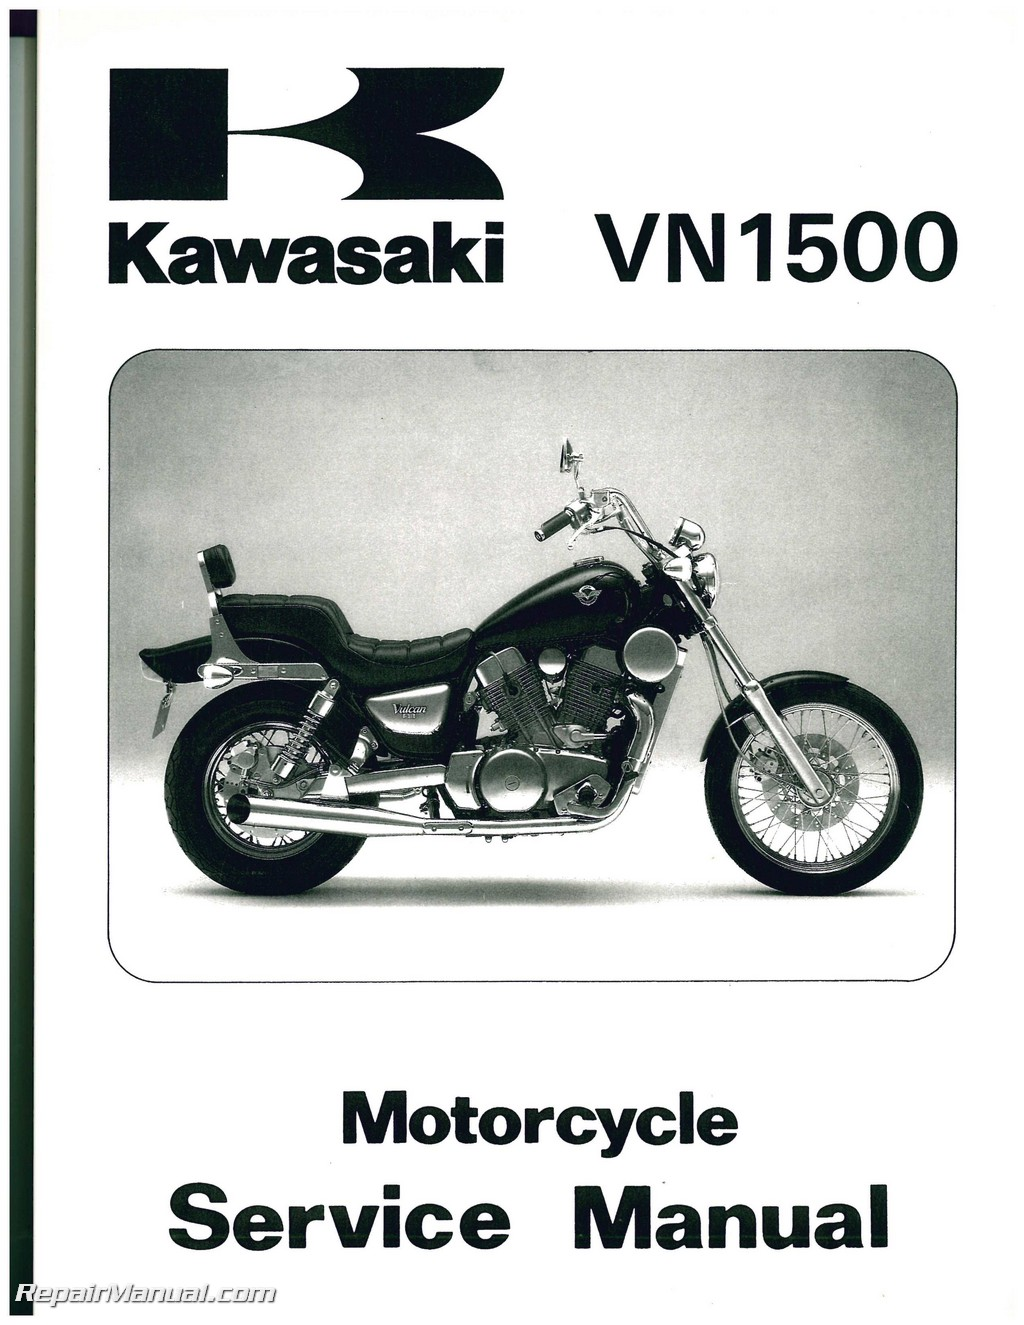 1987 1999 Kawasaki Vulcan Classic